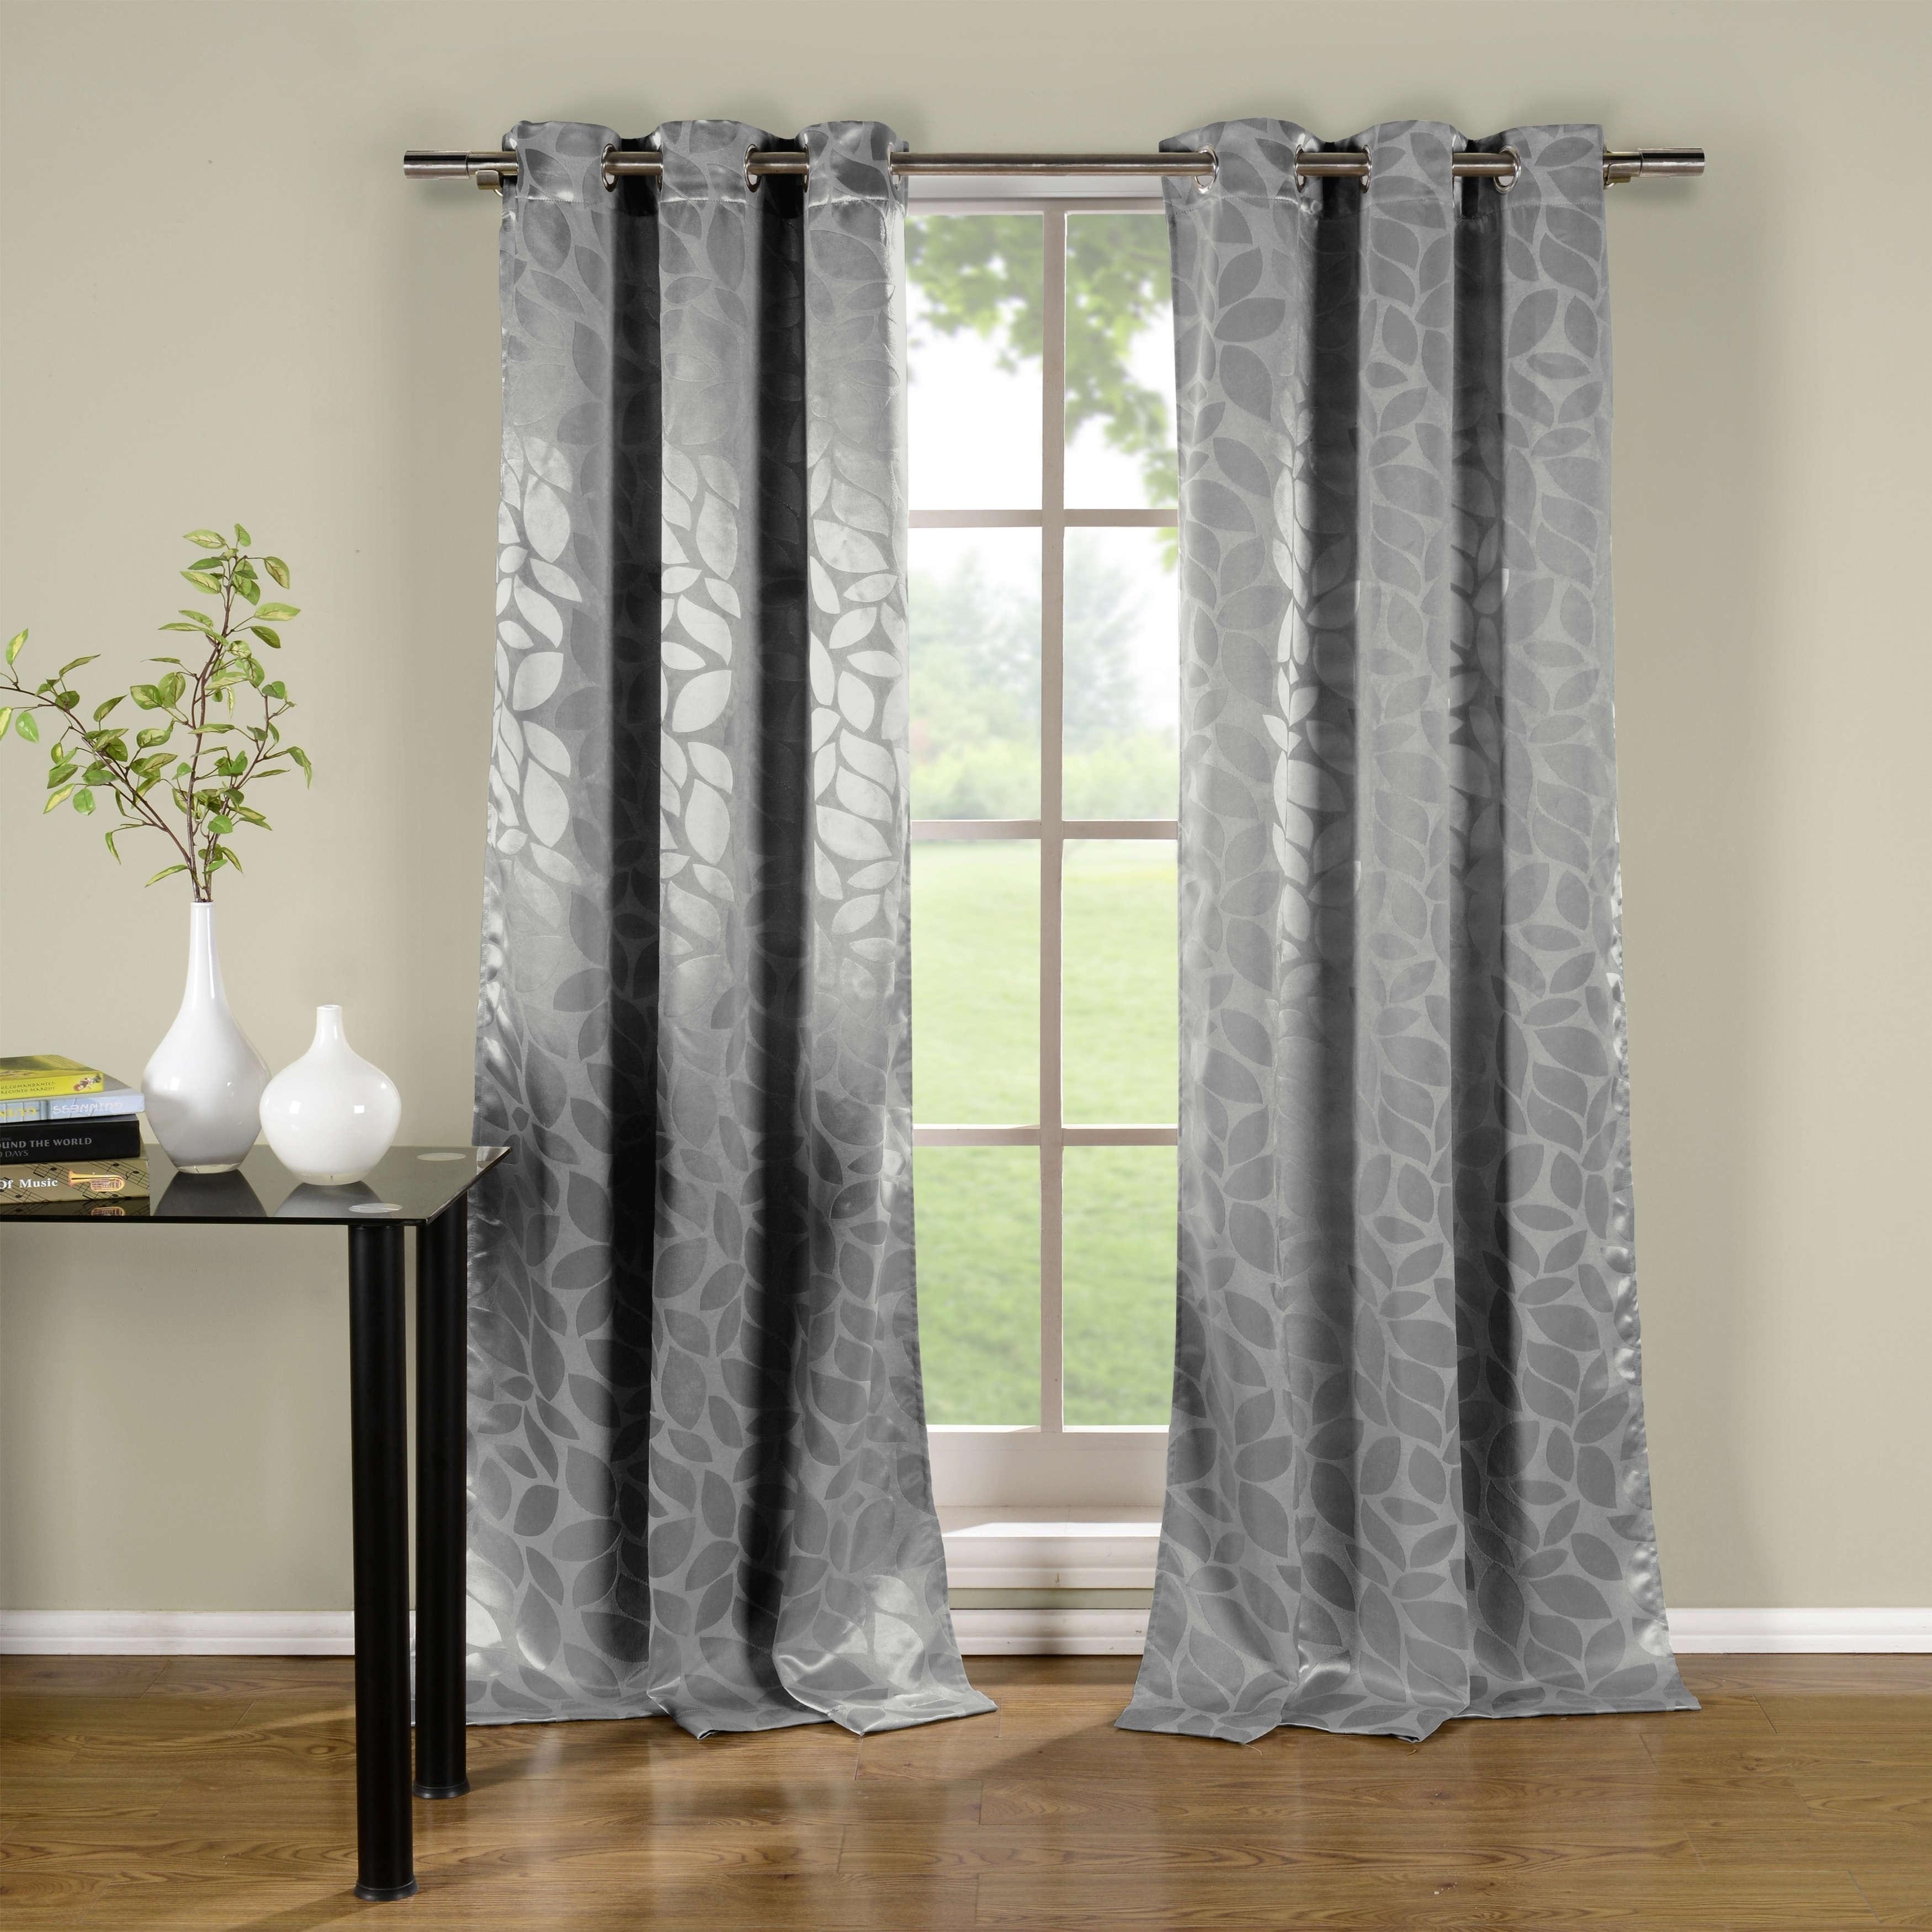 Duck River Zayden Metallic Floral Blackout Curtain Panel Pair